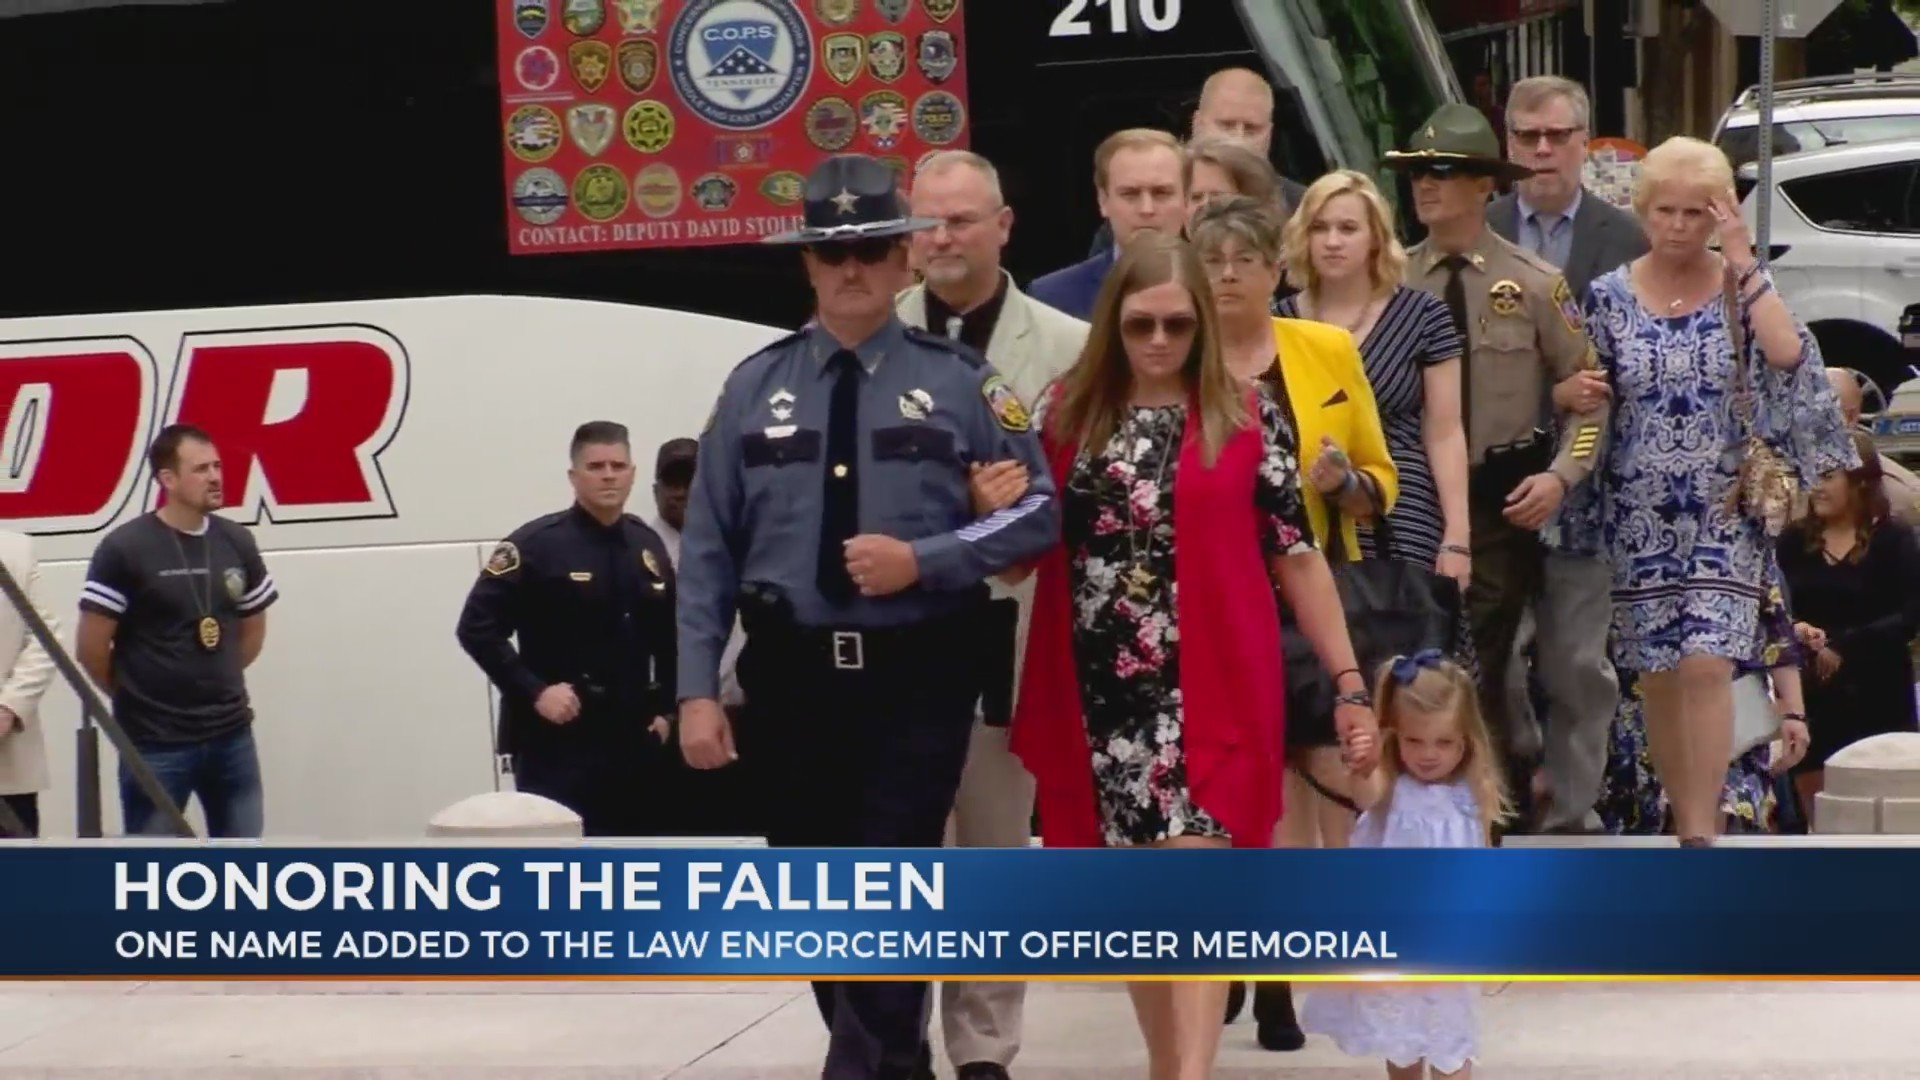 Powerful_memorial_service_for_fallen_off_0_20190511005054